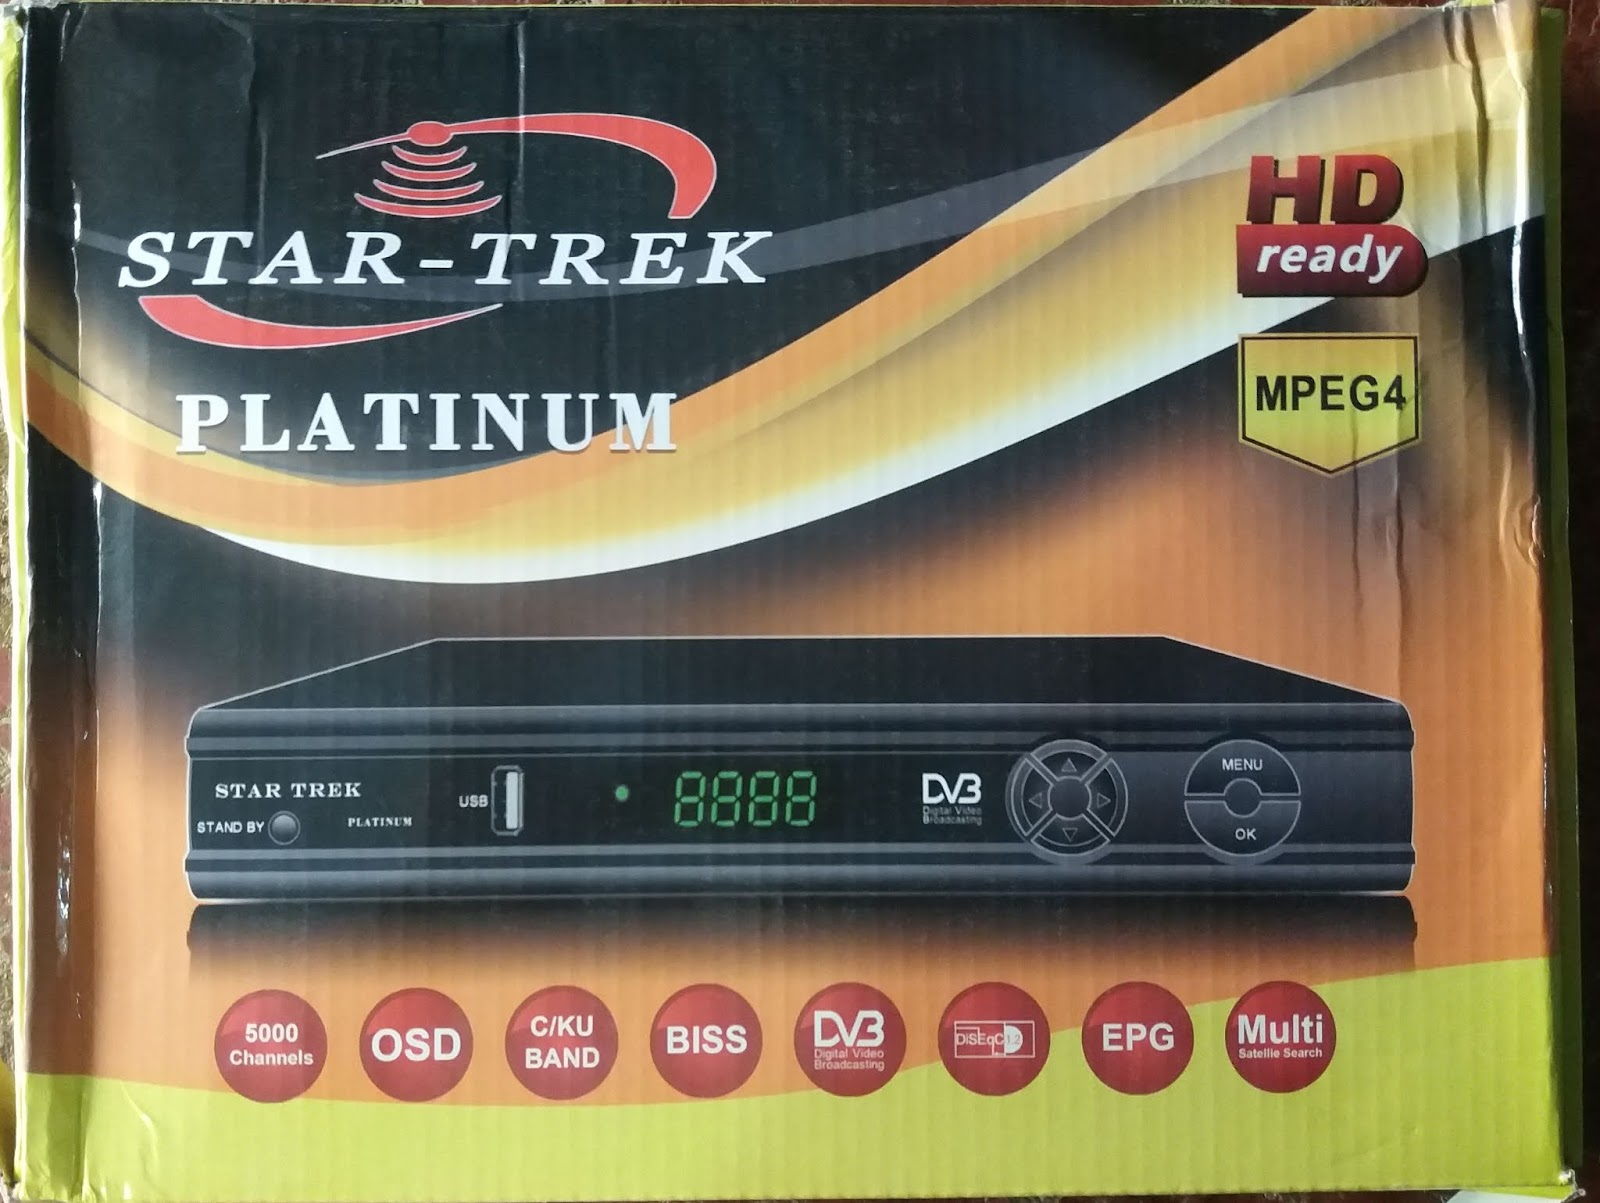 All Dish Receiver Software: STAR TREK PLATINUM HD RECEIVER